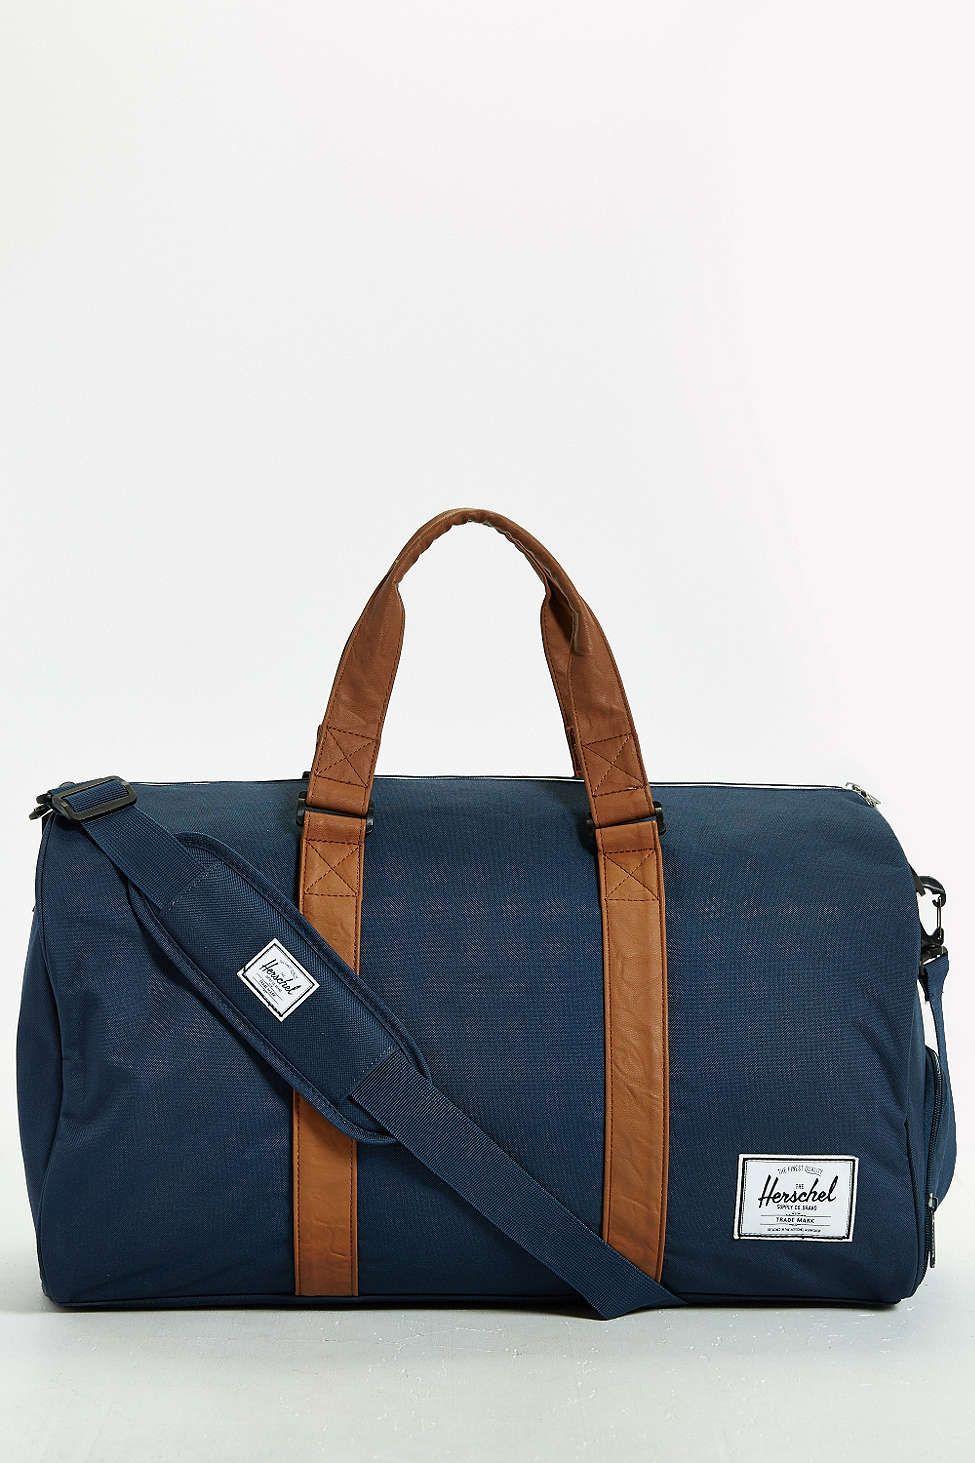 c9355f94155 Herschel Supply Co. Novel Weekender Duffel Bag